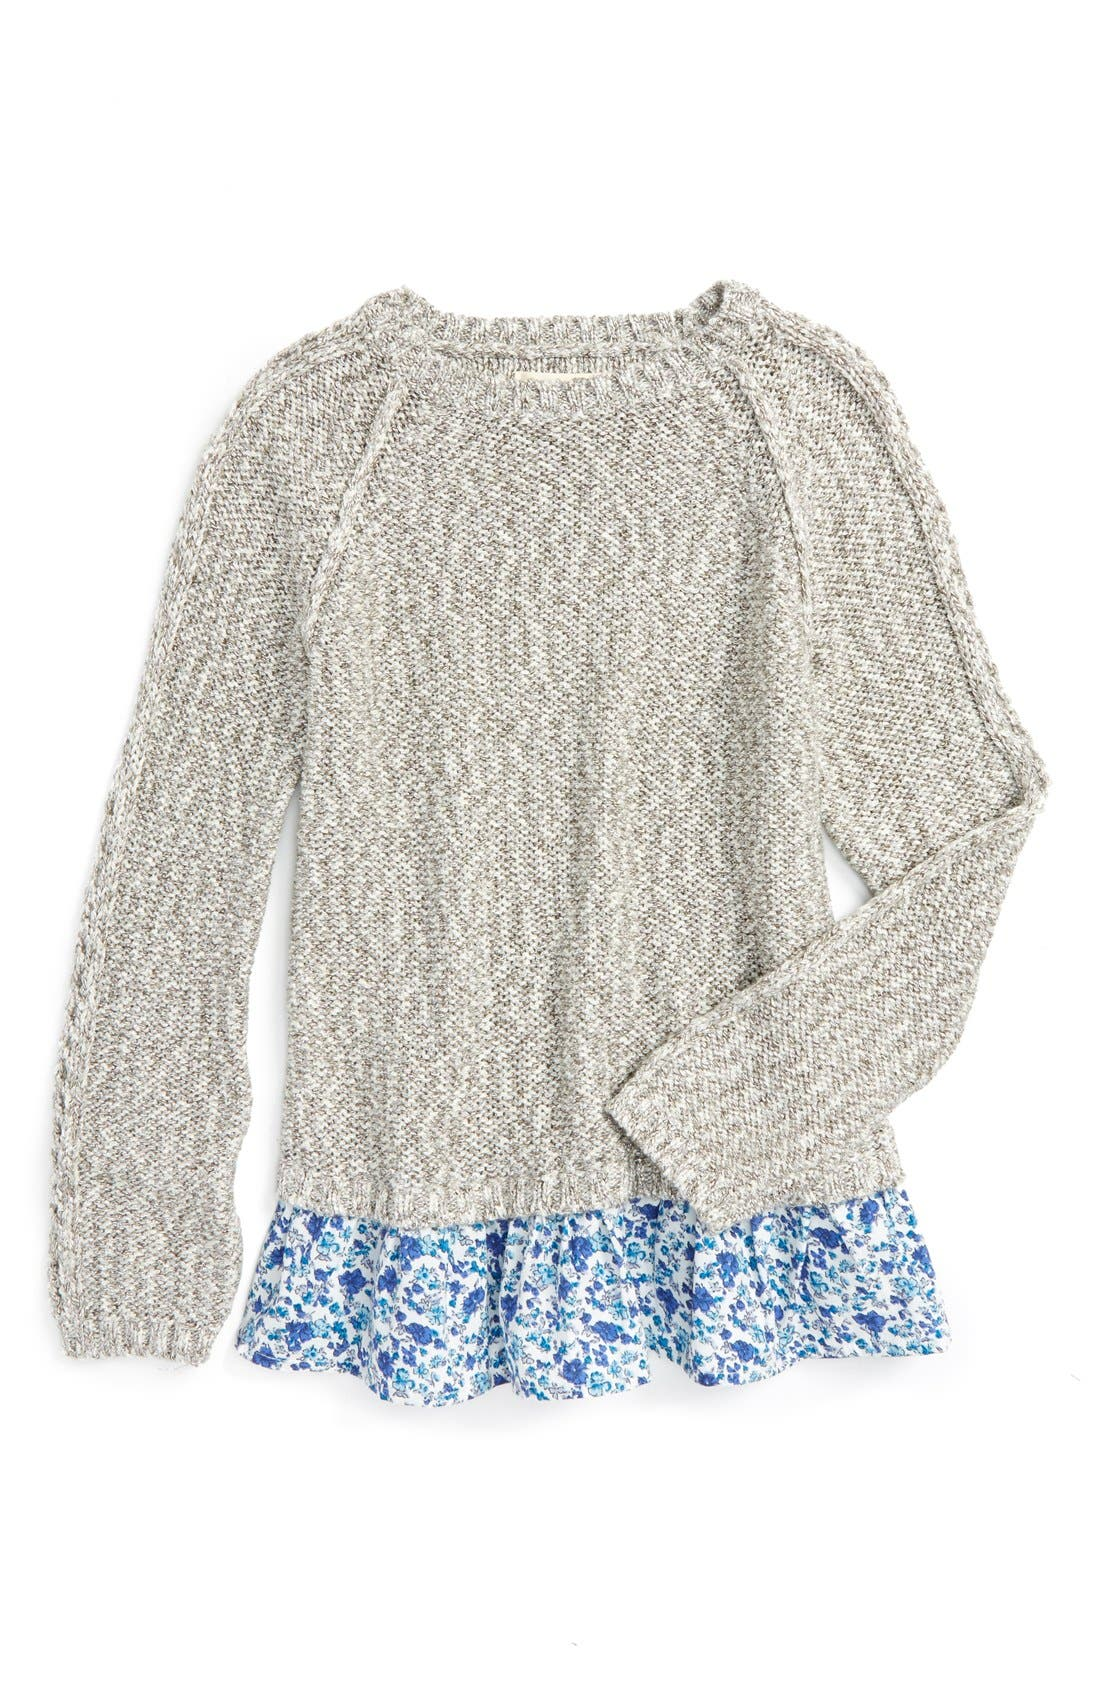 Alternate Image 1 Selected - Tucker + Tate Sparkle Ruffle Sweater (Toddler Girls, Little Girls & Big Girls)